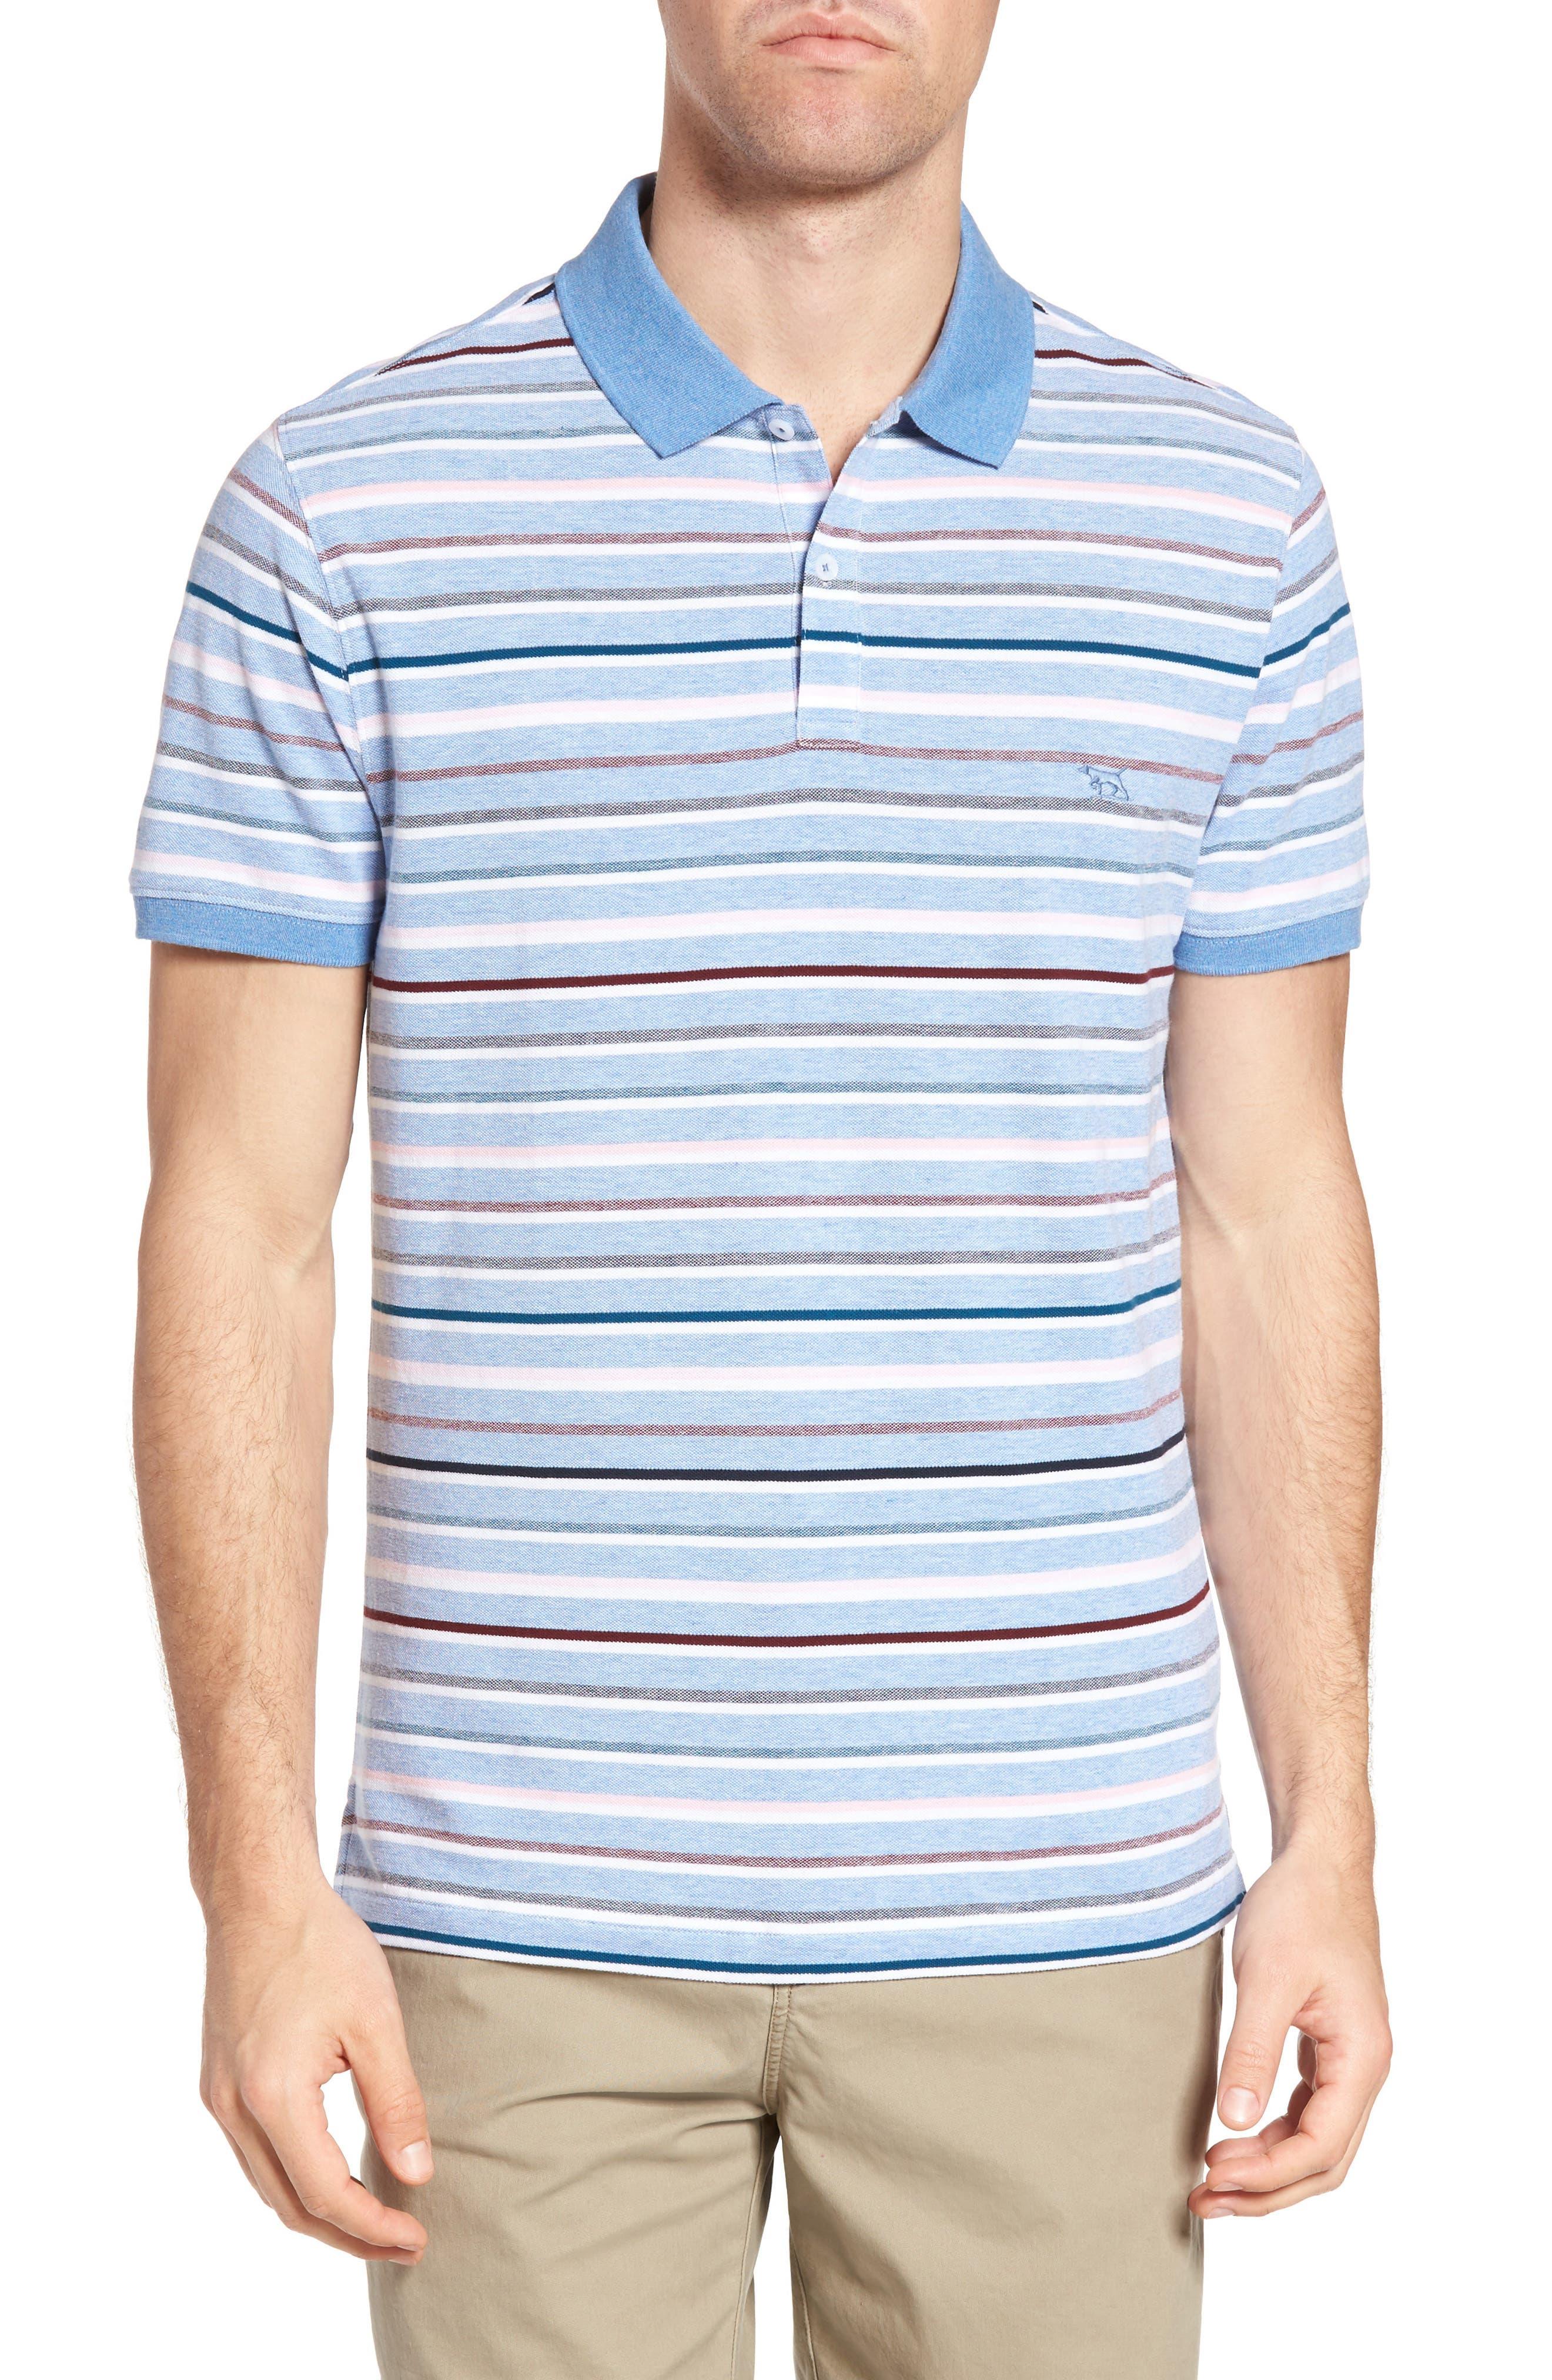 Gowan Hill Sports Fit Cotton Polo,                             Main thumbnail 1, color,                             Stonewash